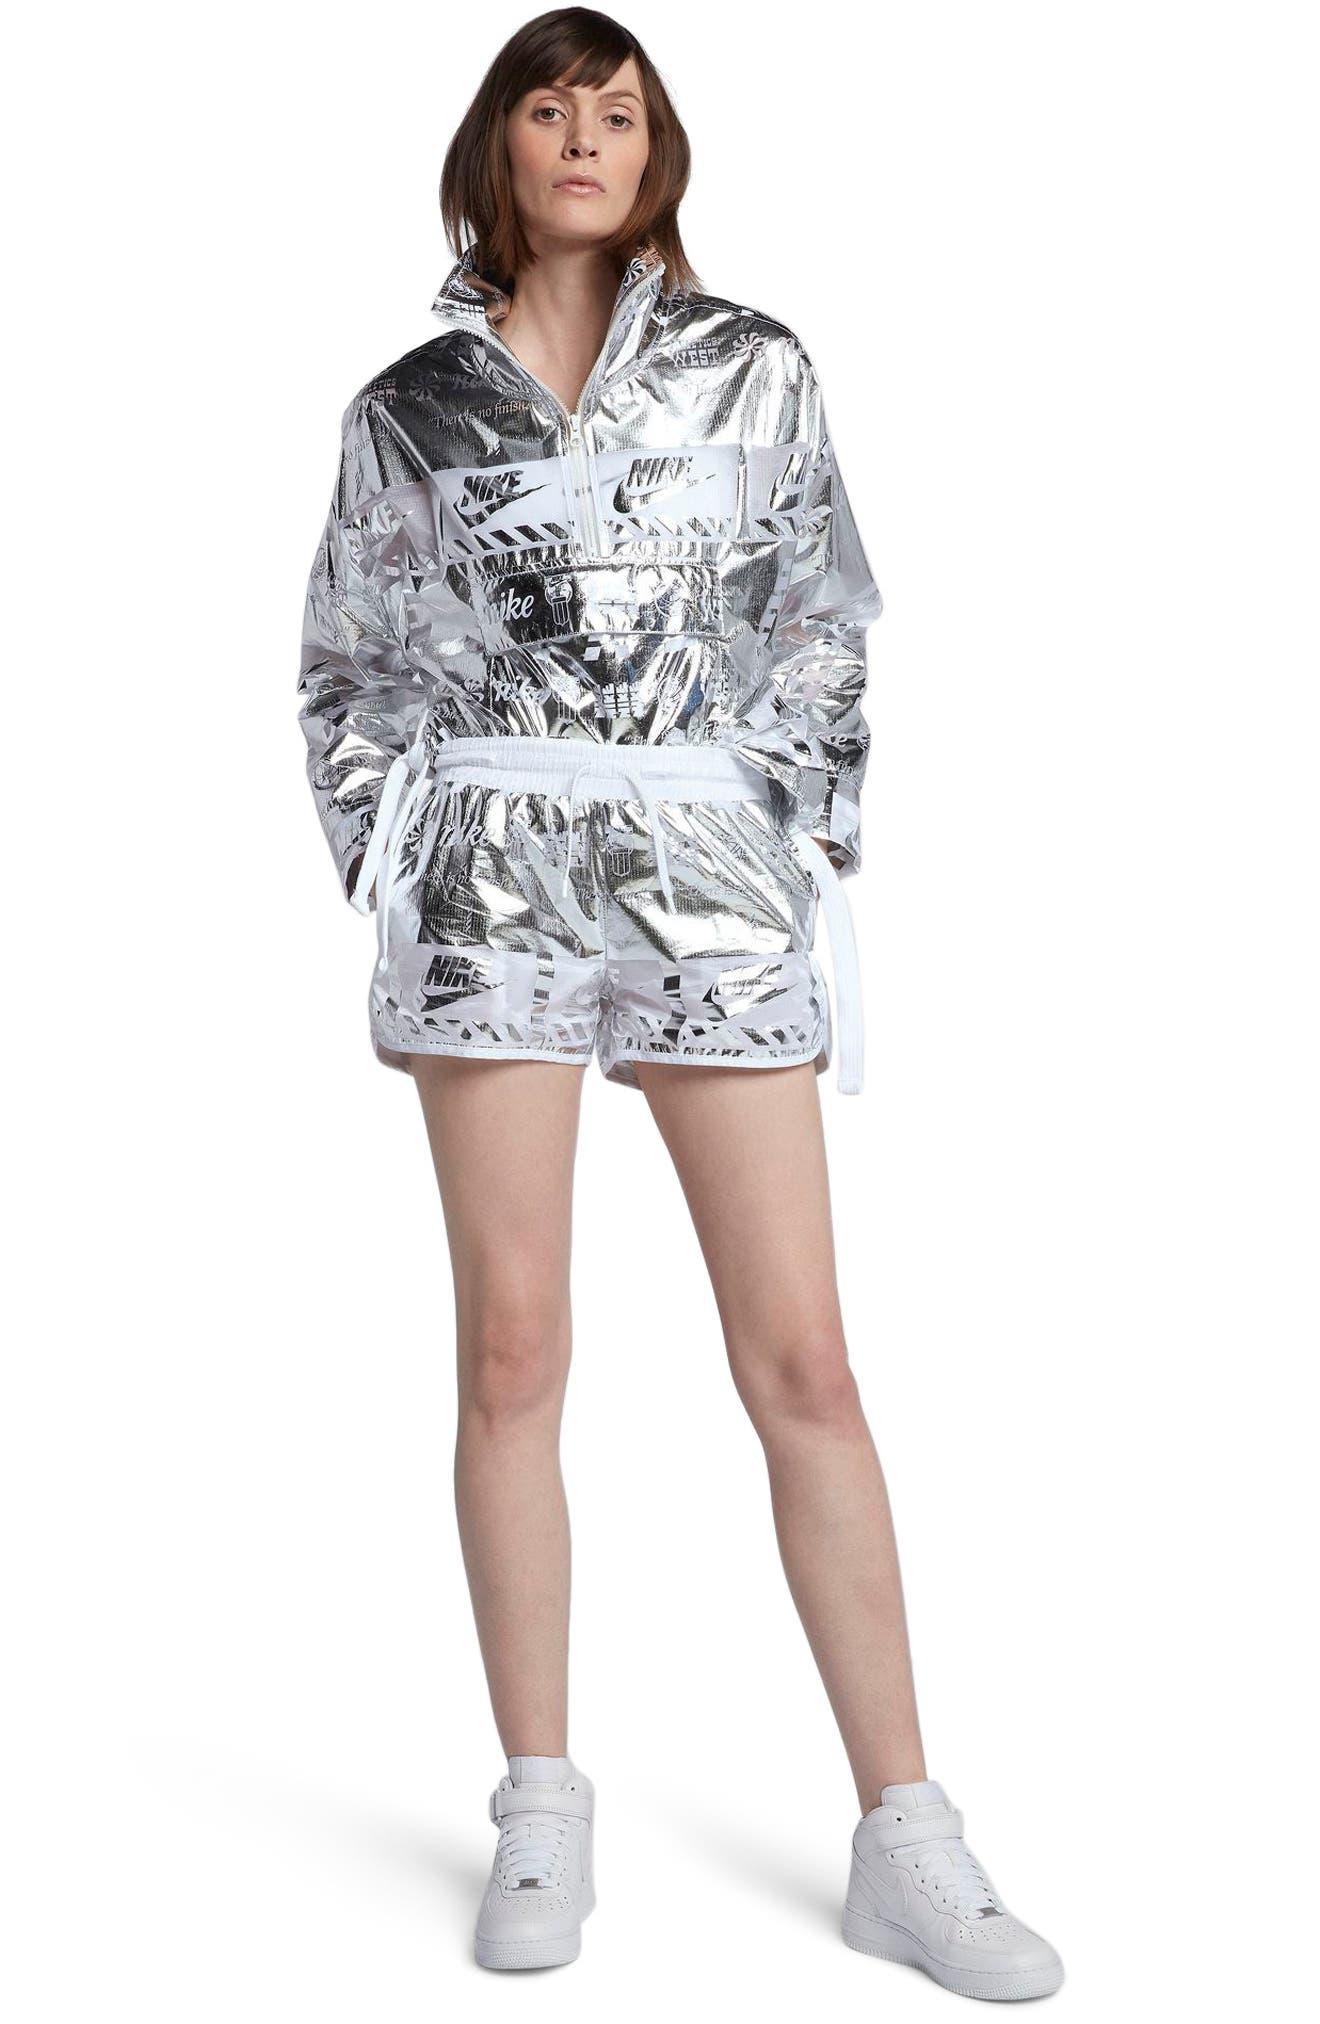 Sportswear Women's Metallic Shorts,                             Alternate thumbnail 8, color,                             White/ White